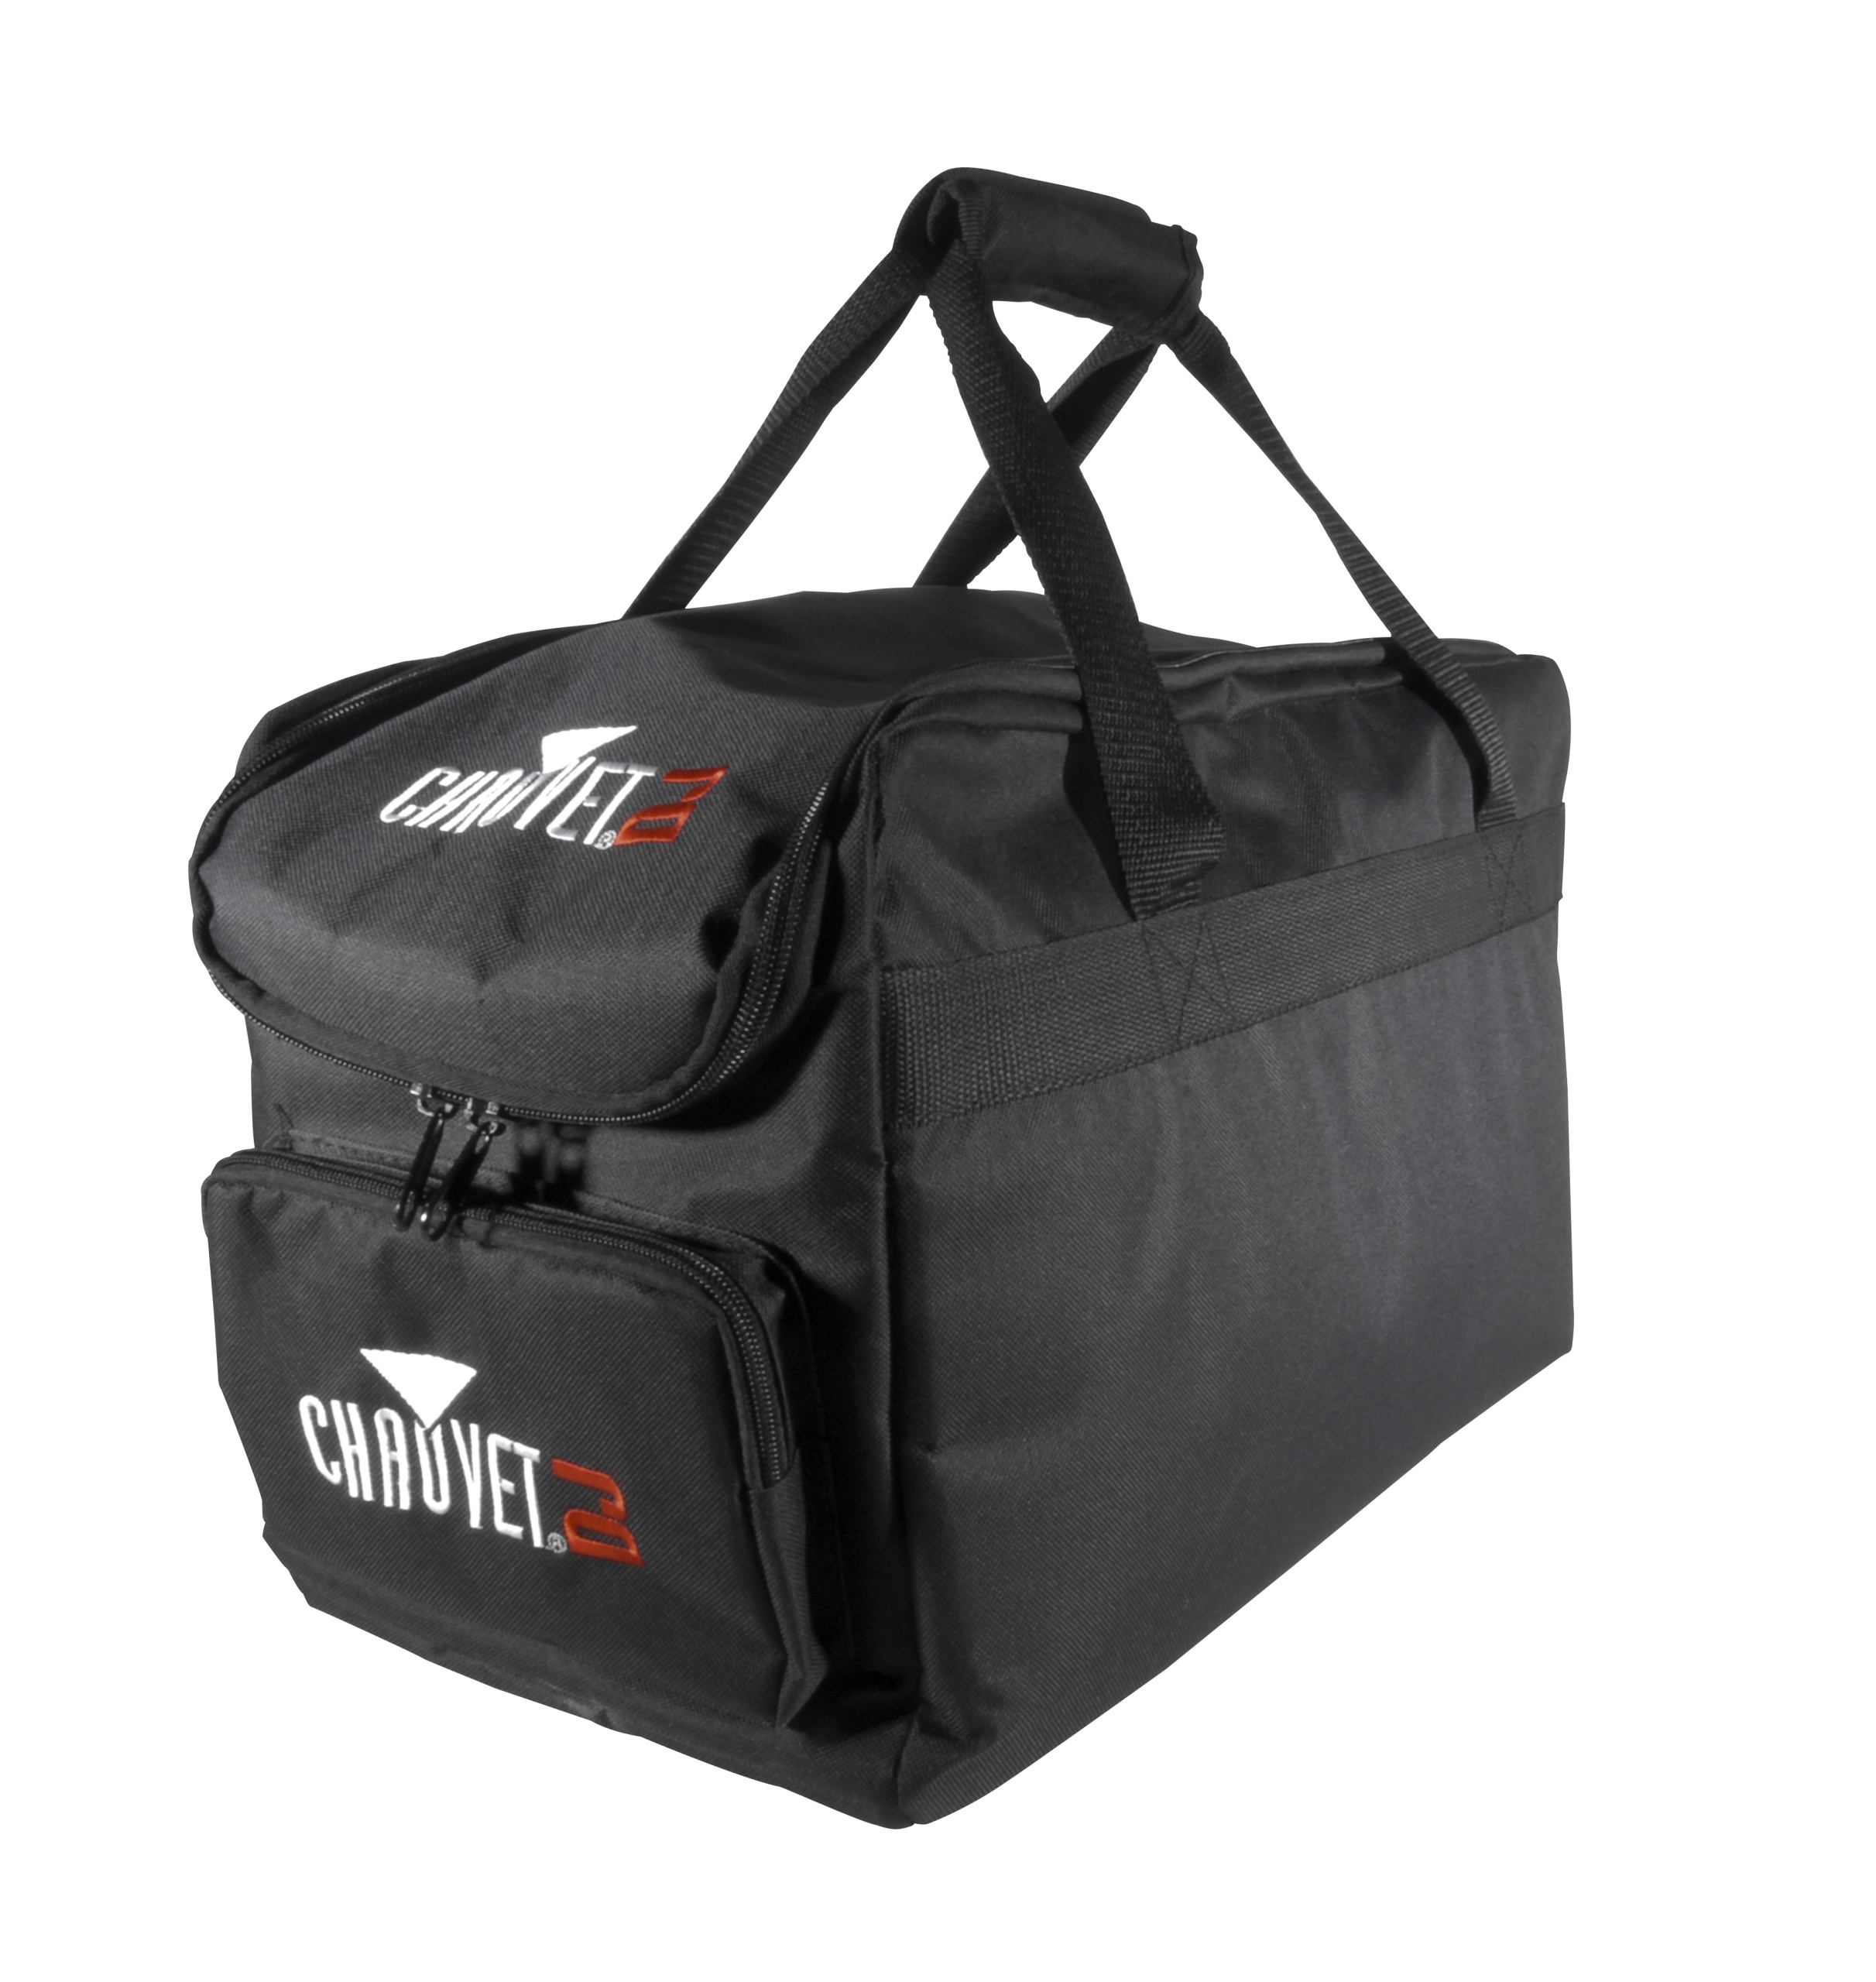 Chauvet CHS-30 VIP Light Gear Bag